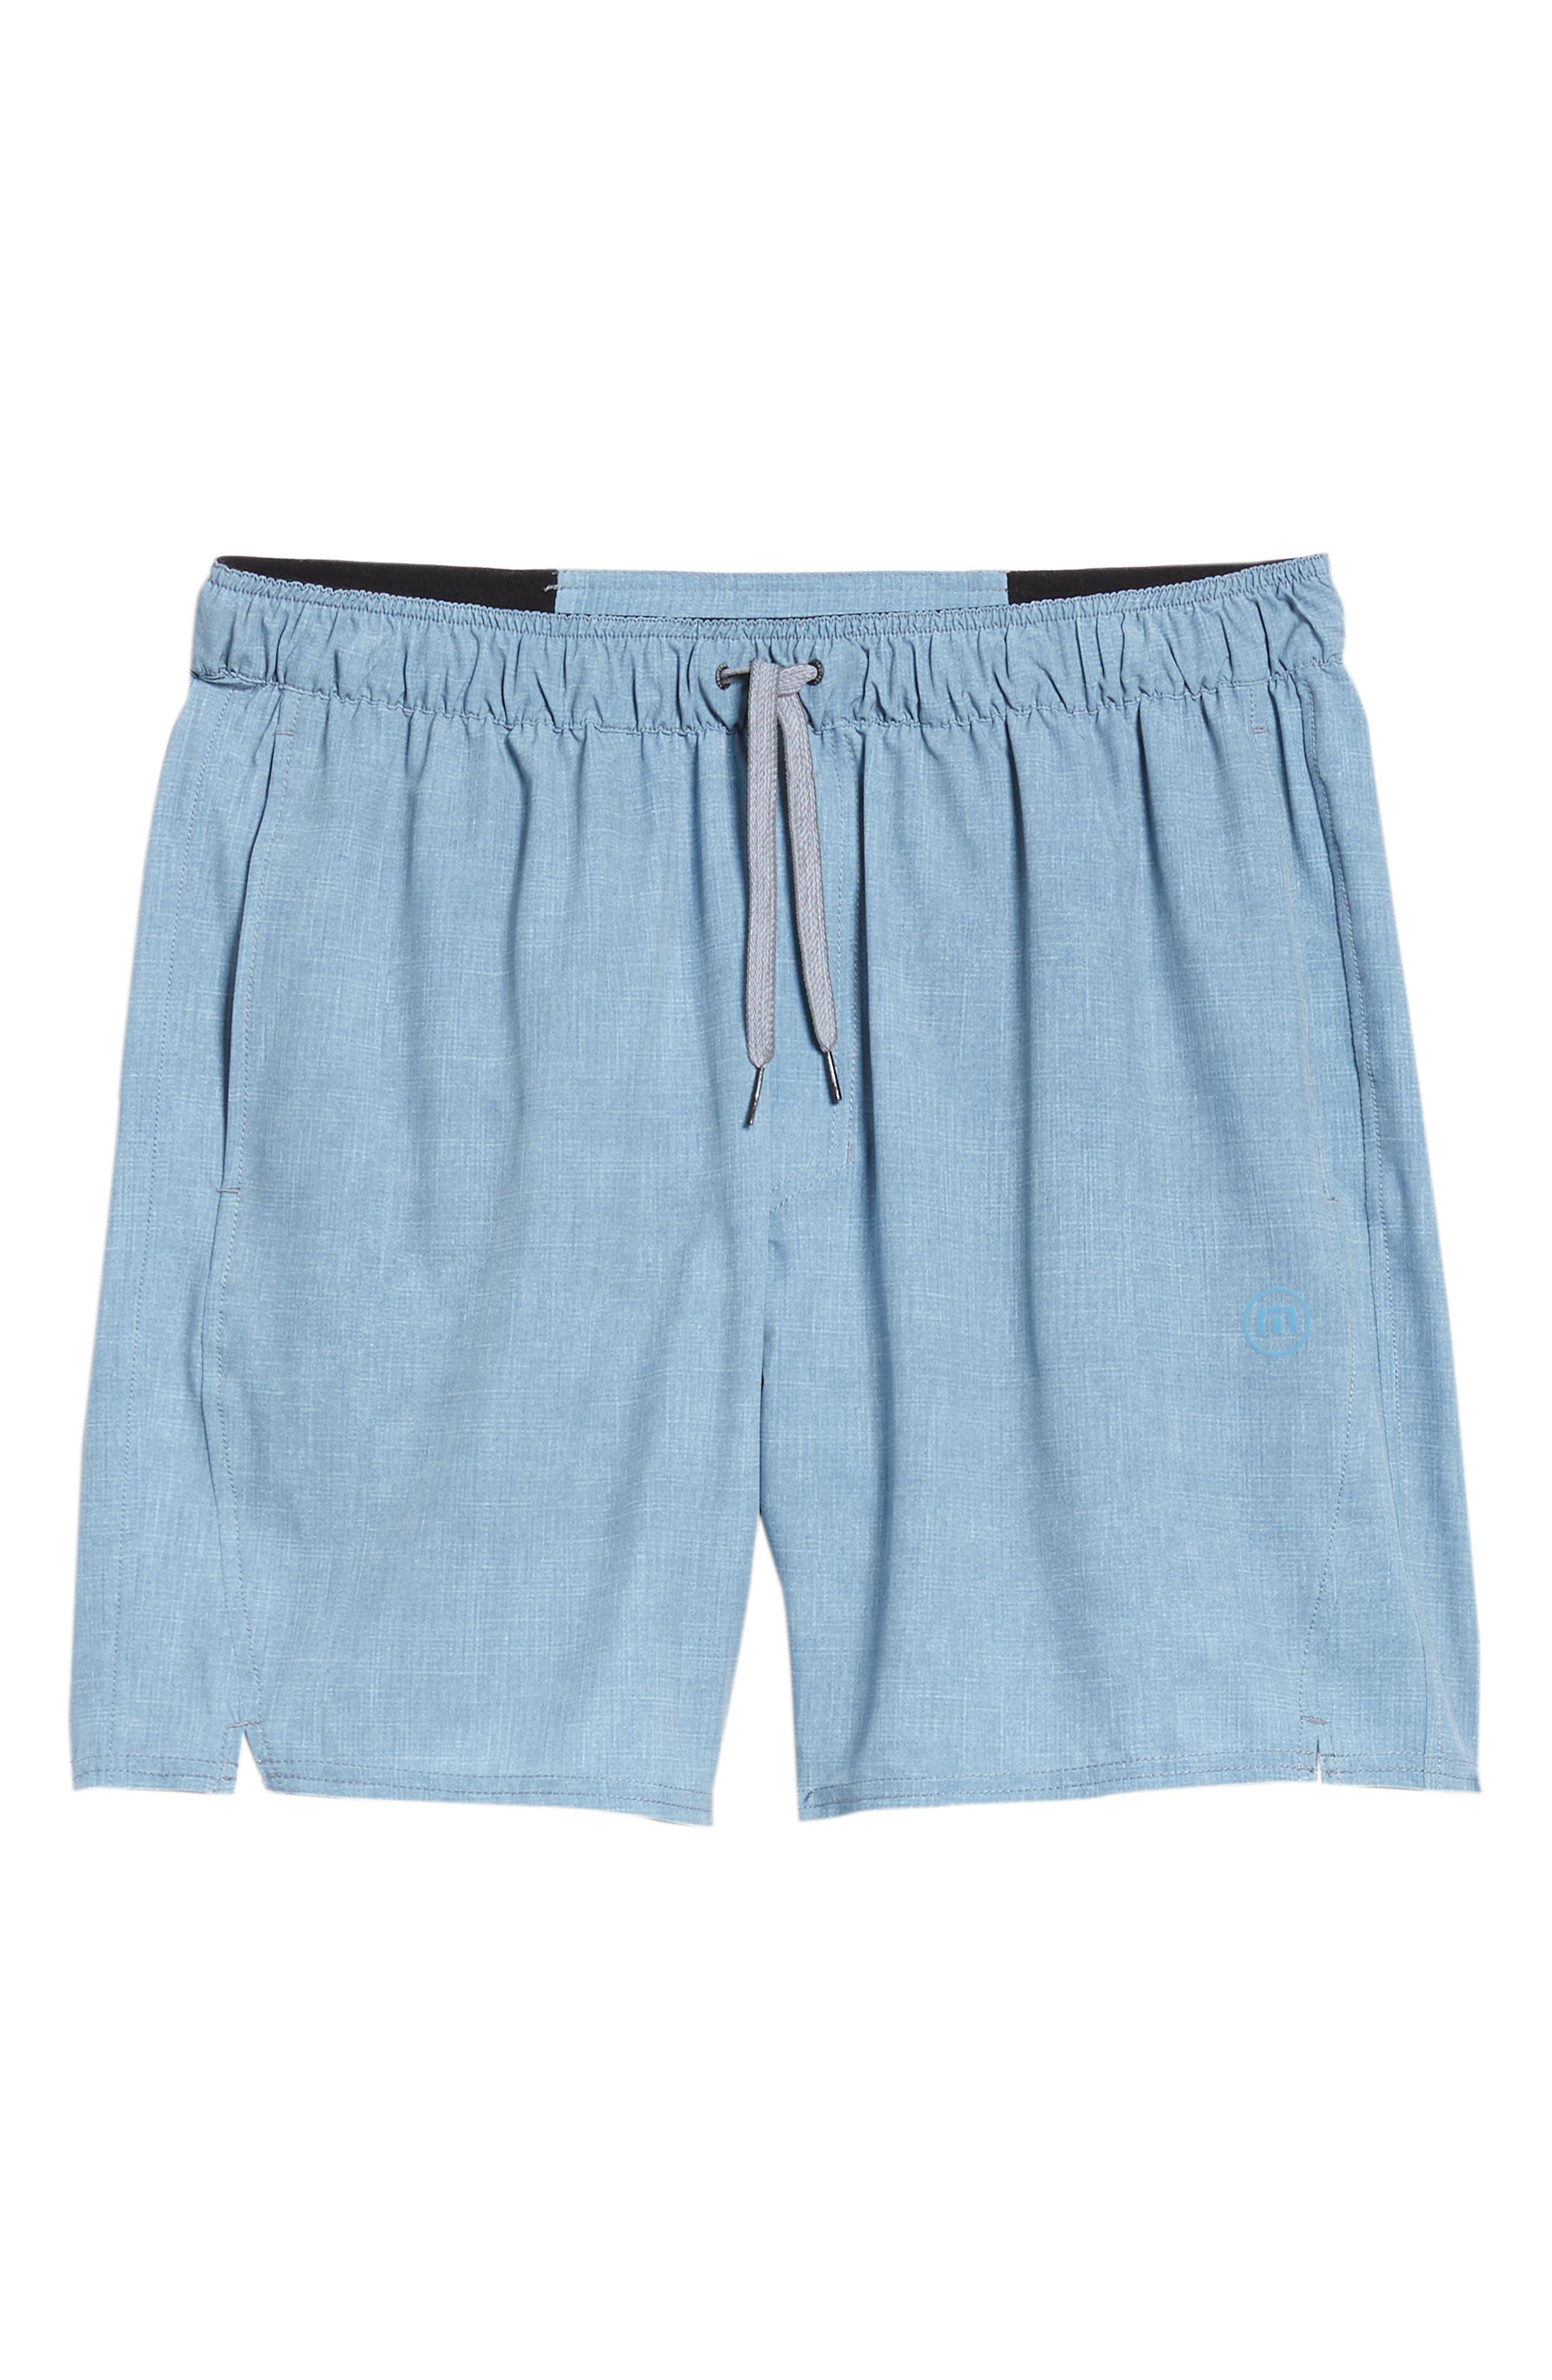 Digits Shorts,                             Alternate thumbnail 6, color,                             HEATHER SHARKSKIN